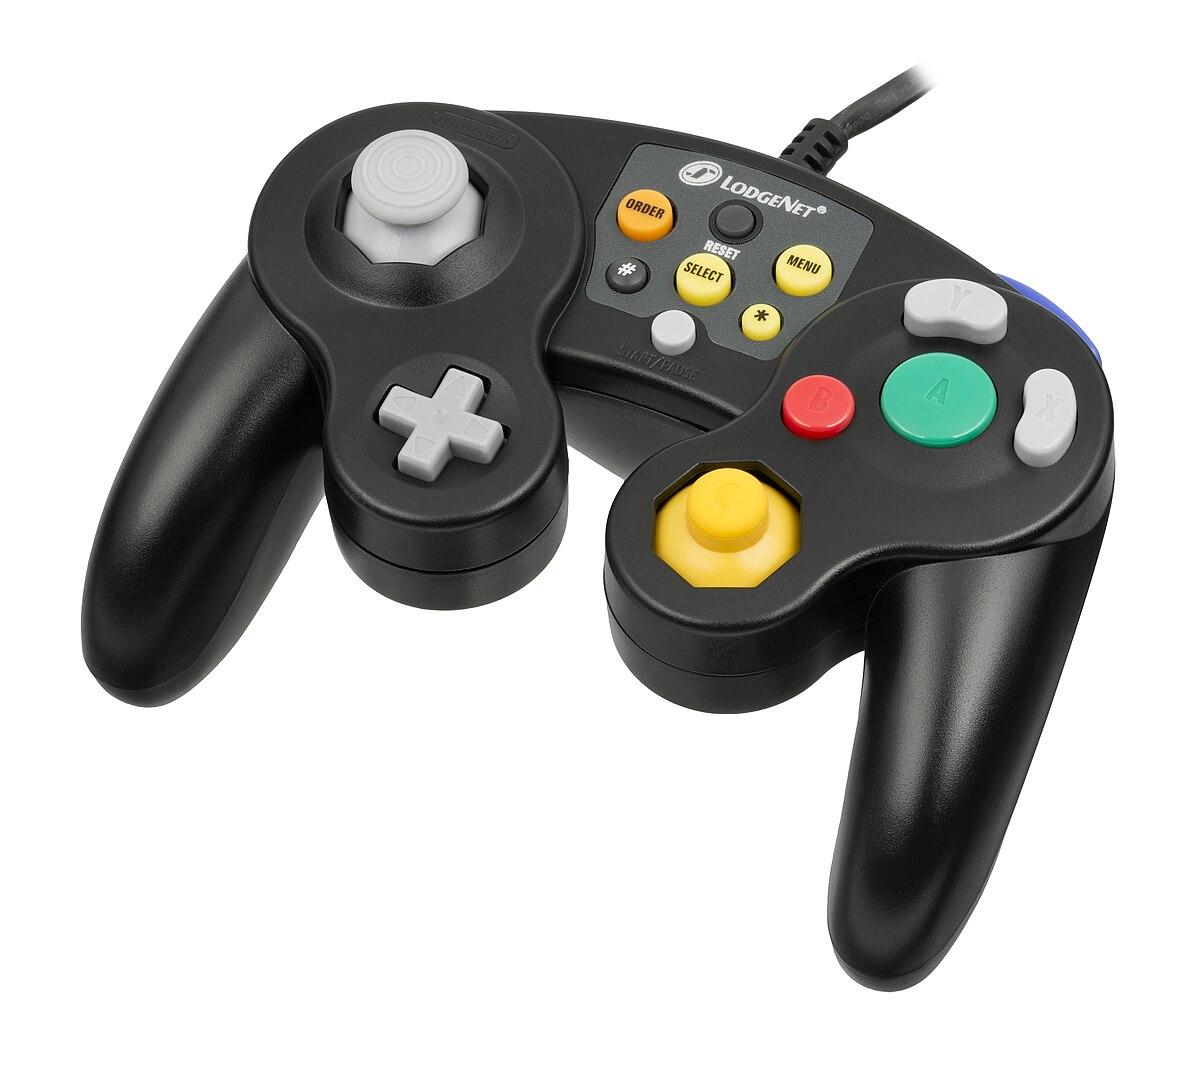 nintendo controllers game gamecube - photo #4